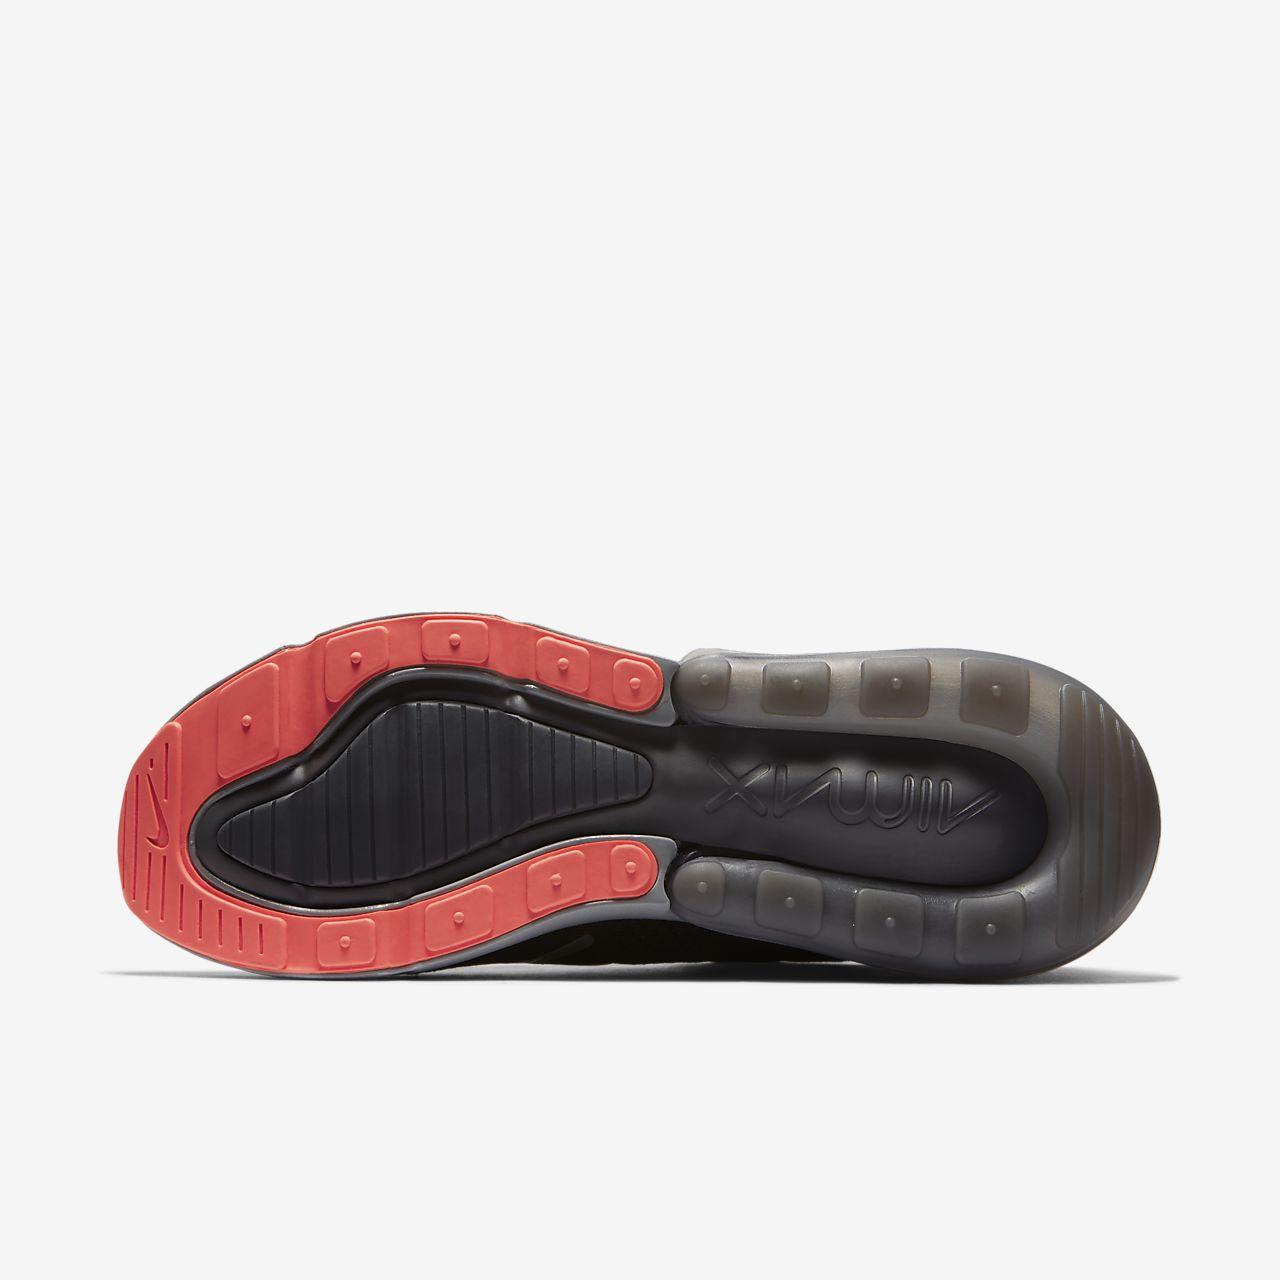 09609104f0f1 Nike Air Max 270 Flyknit Men s Shoe. Nike.com GB